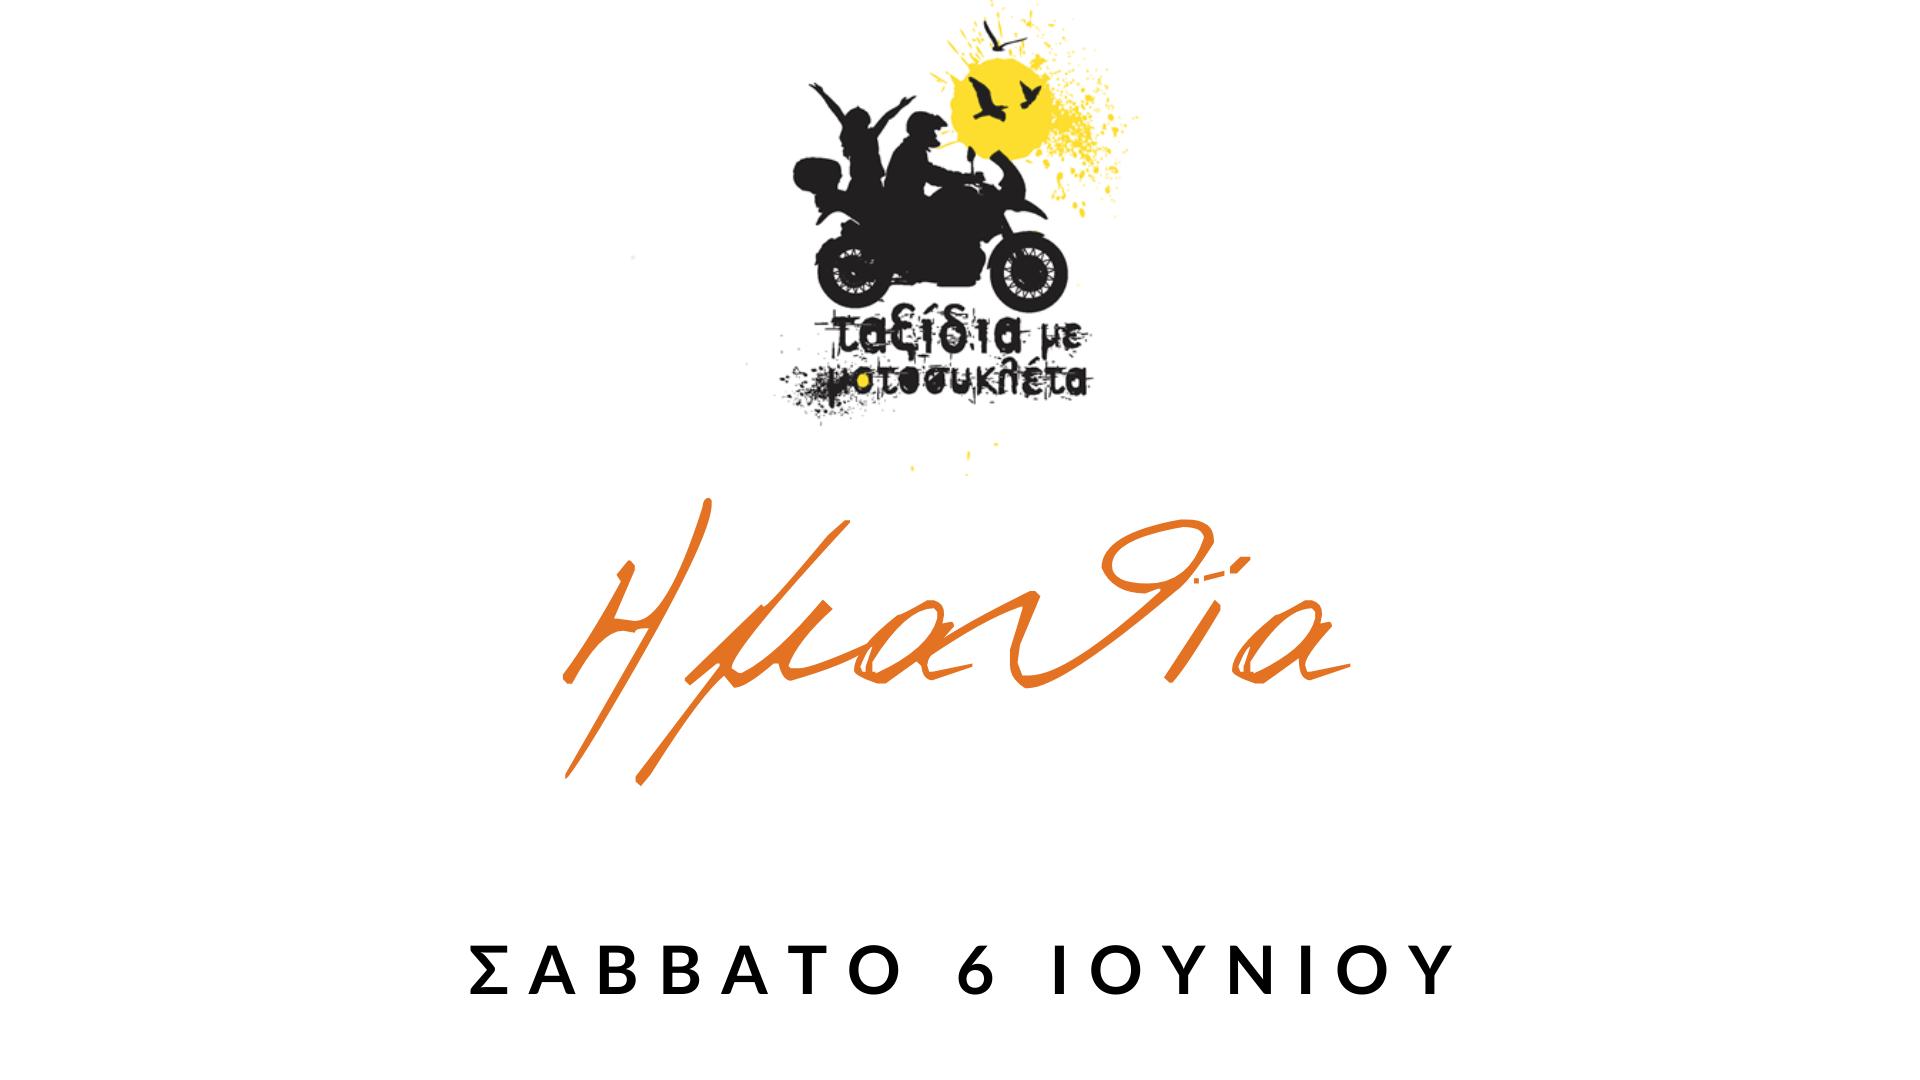 Imathia-fb-event